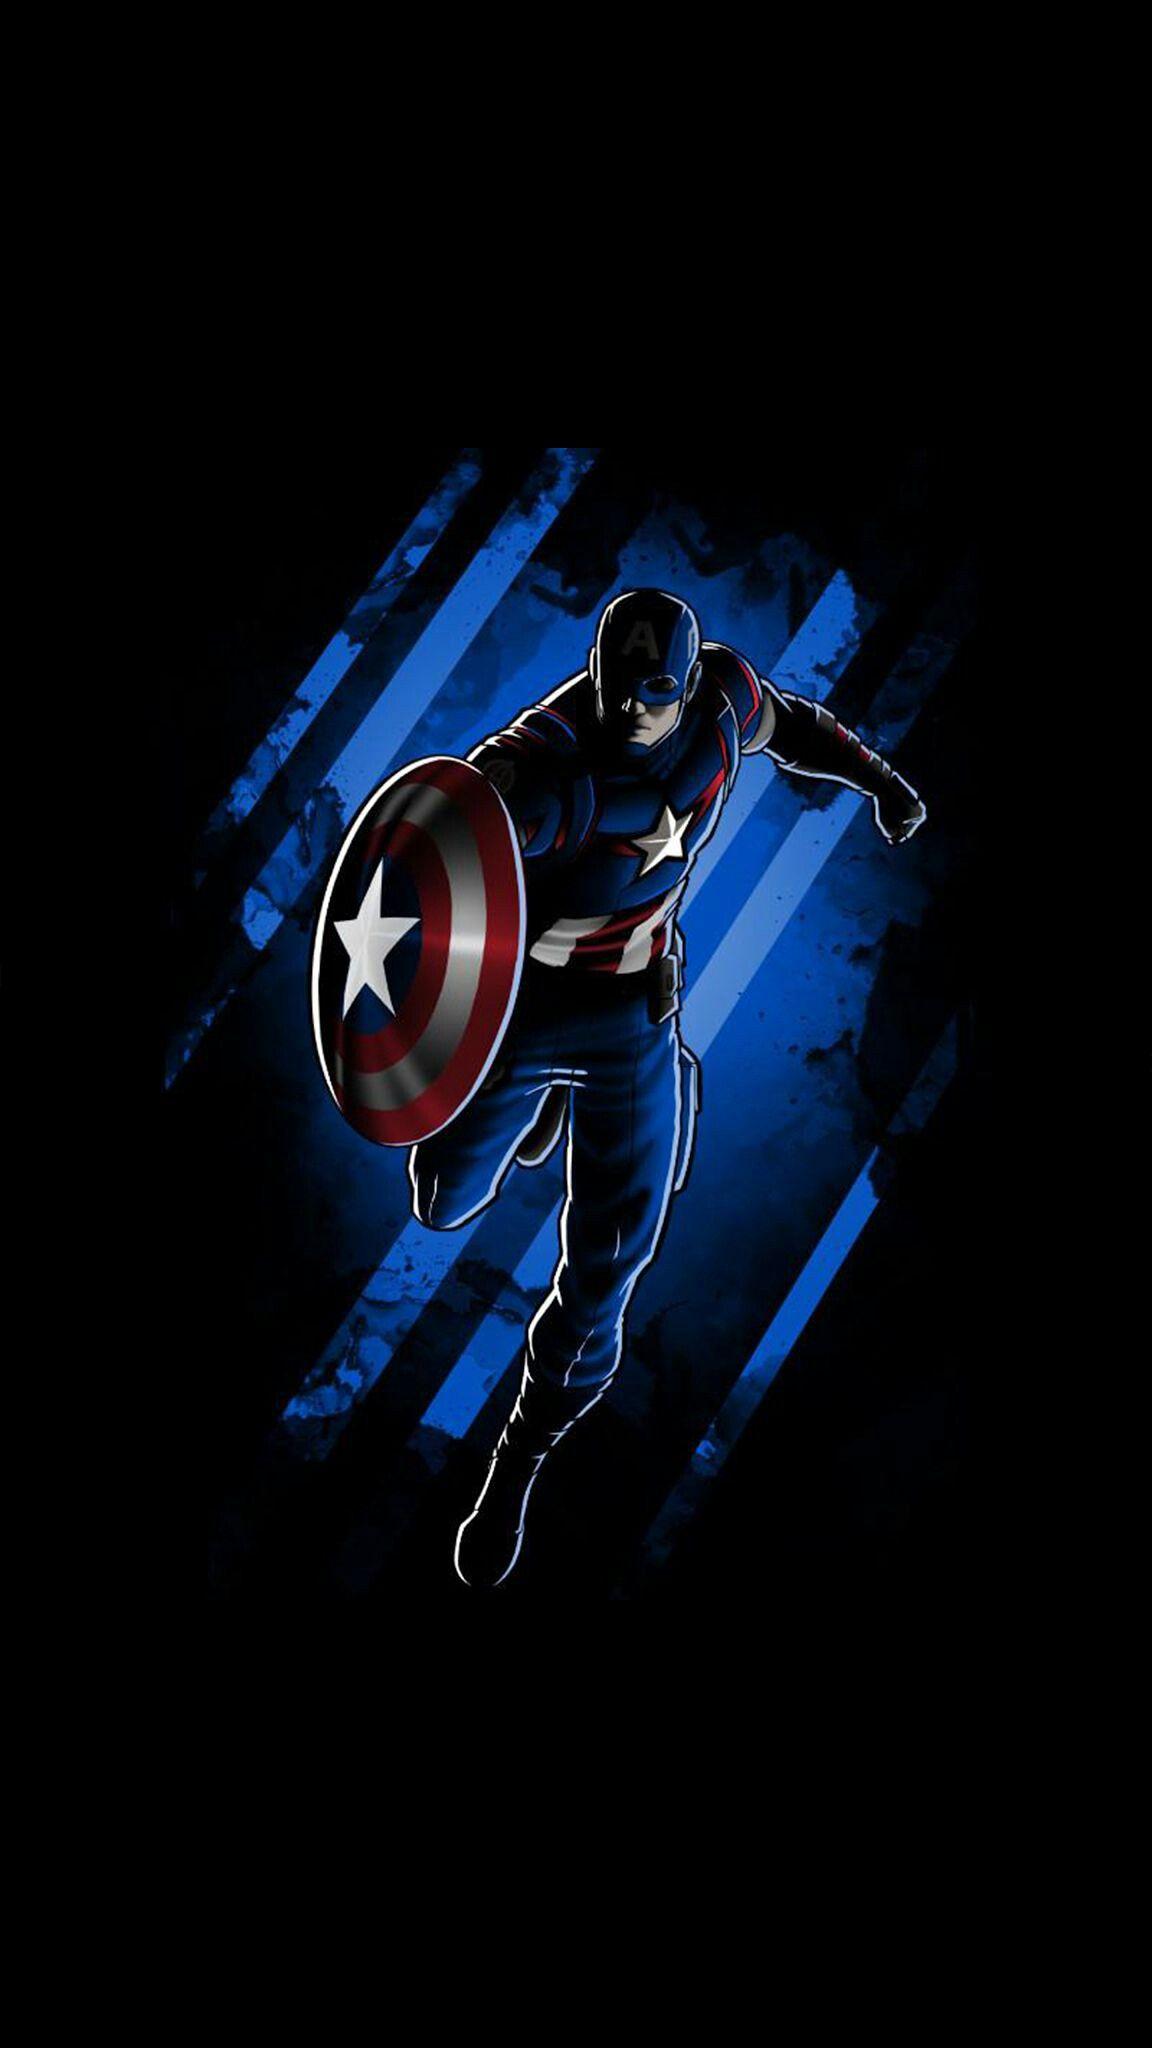 Captain America Dark Minimal Background iPhone Wallpaper